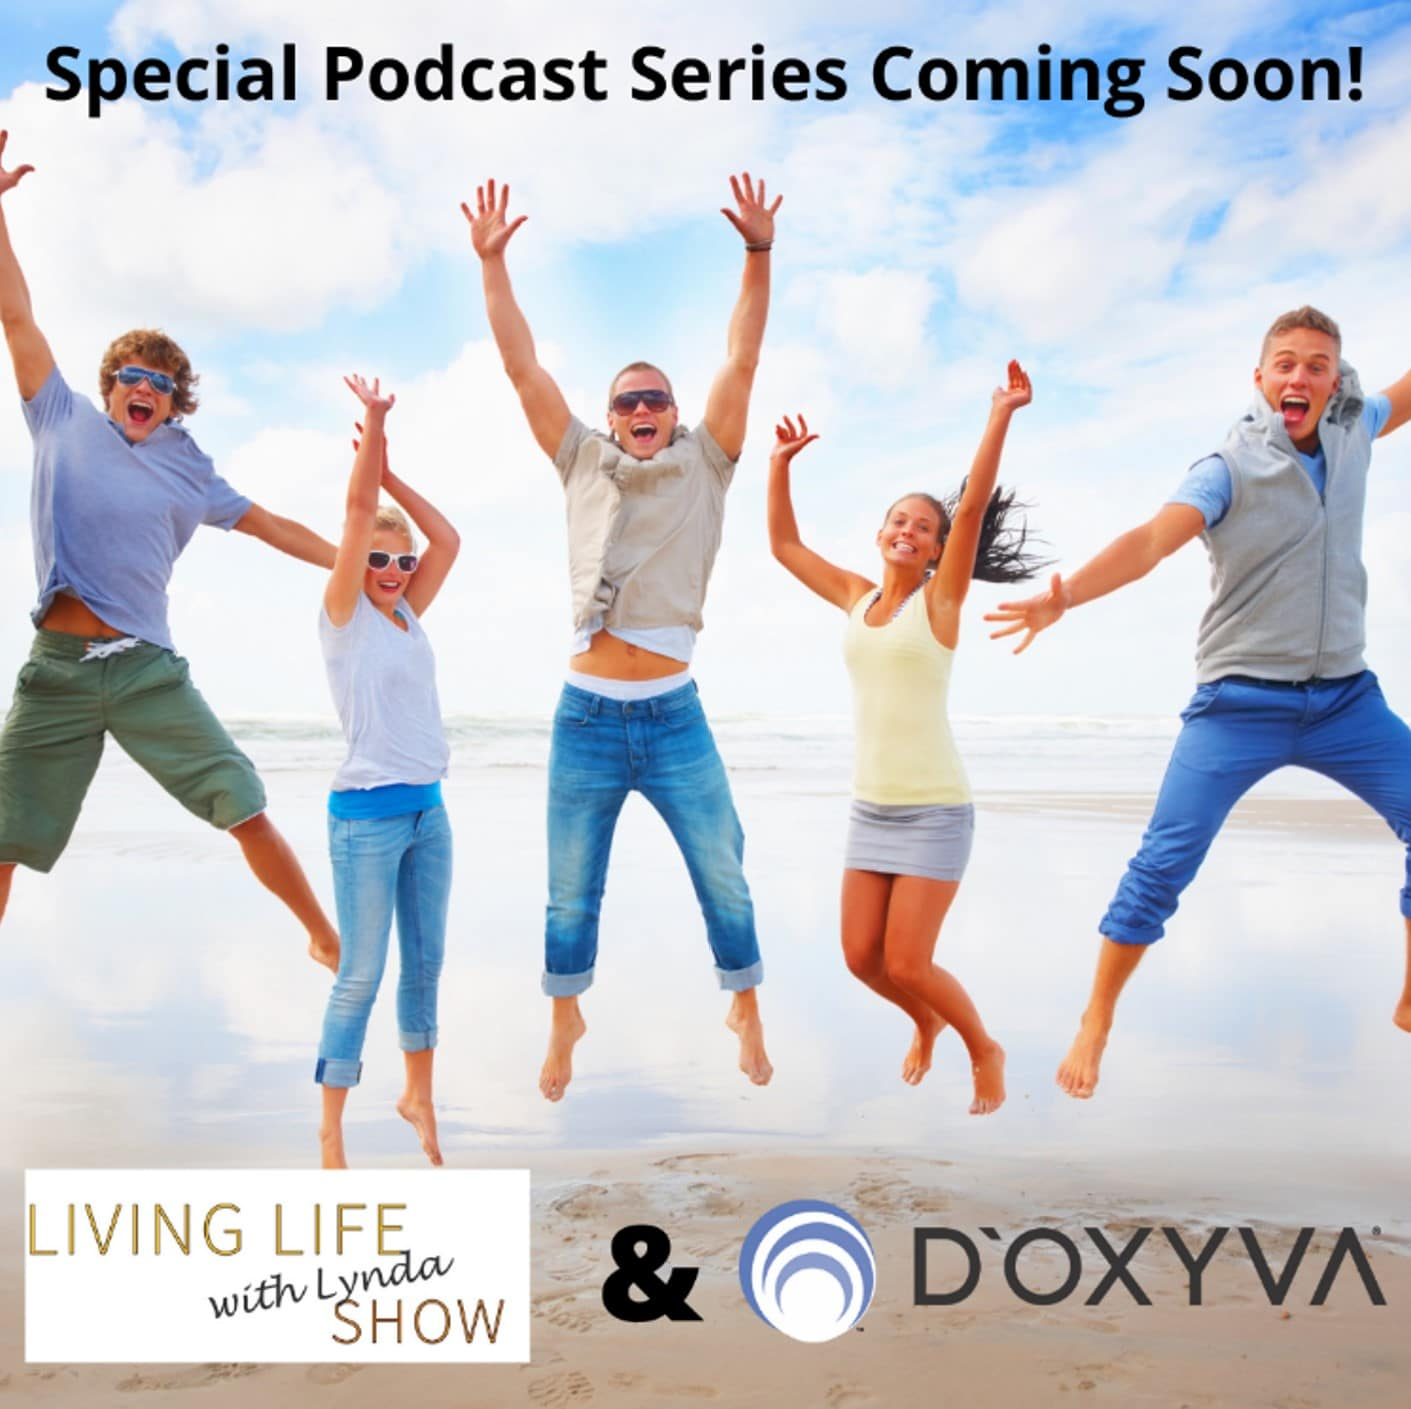 Living Life with Lynda Show & D'OXYVA